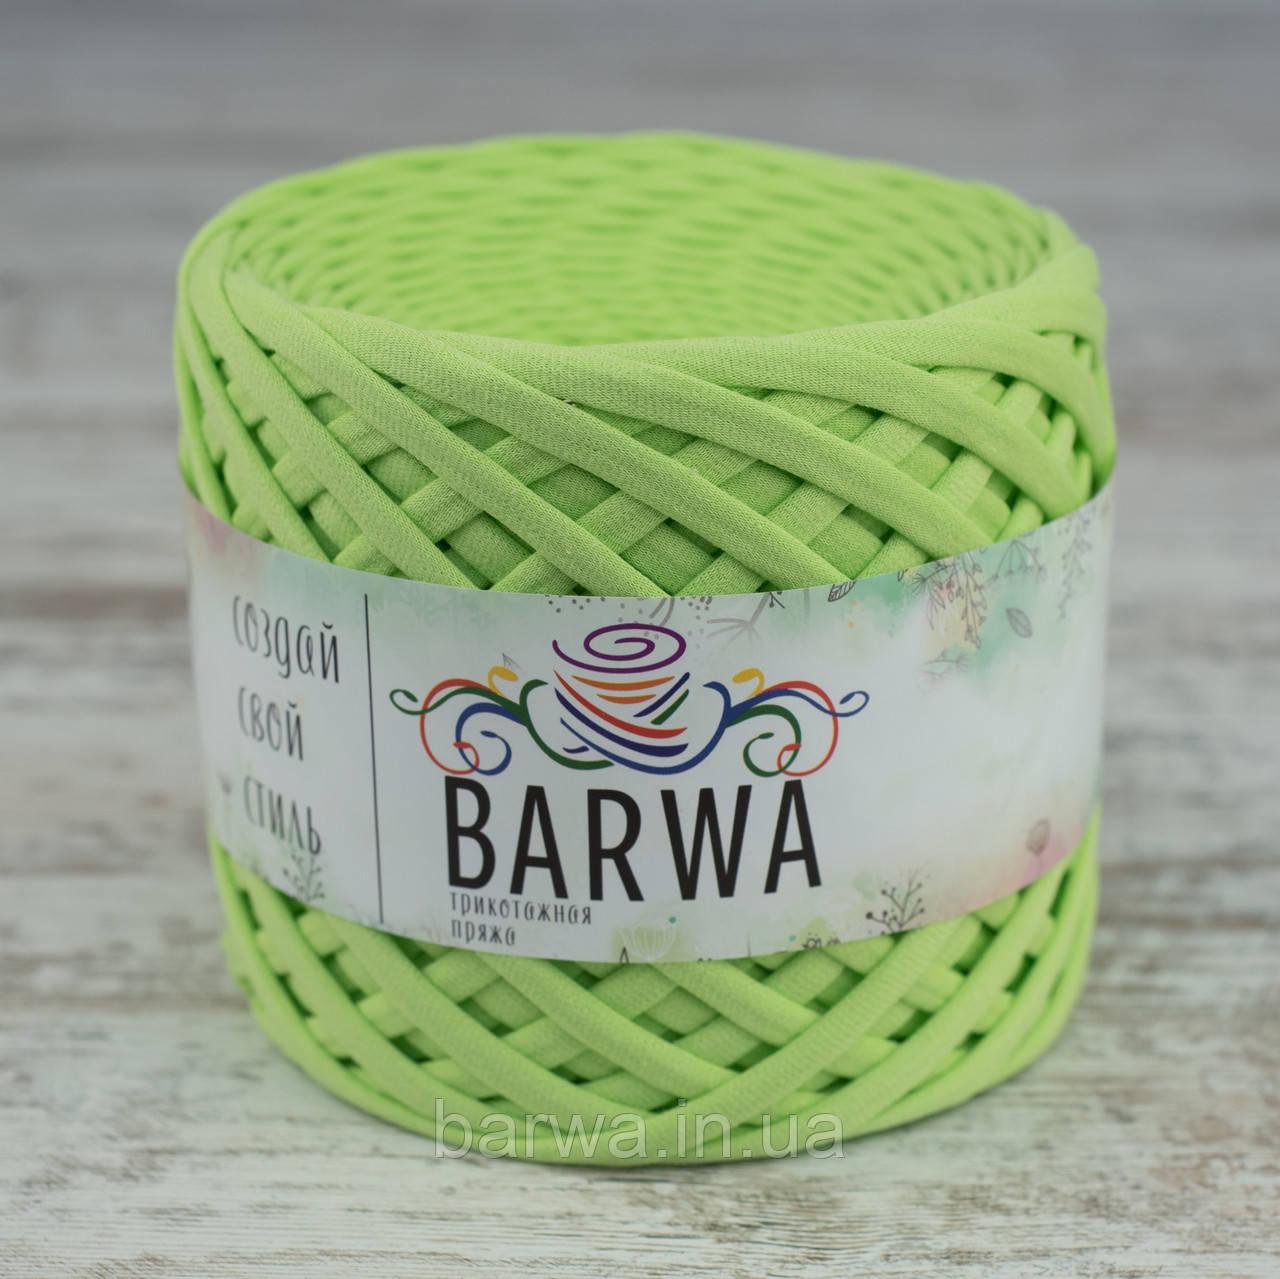 Трикотажная пряжа BARWA standart 7-9 мм, цвет Васаби